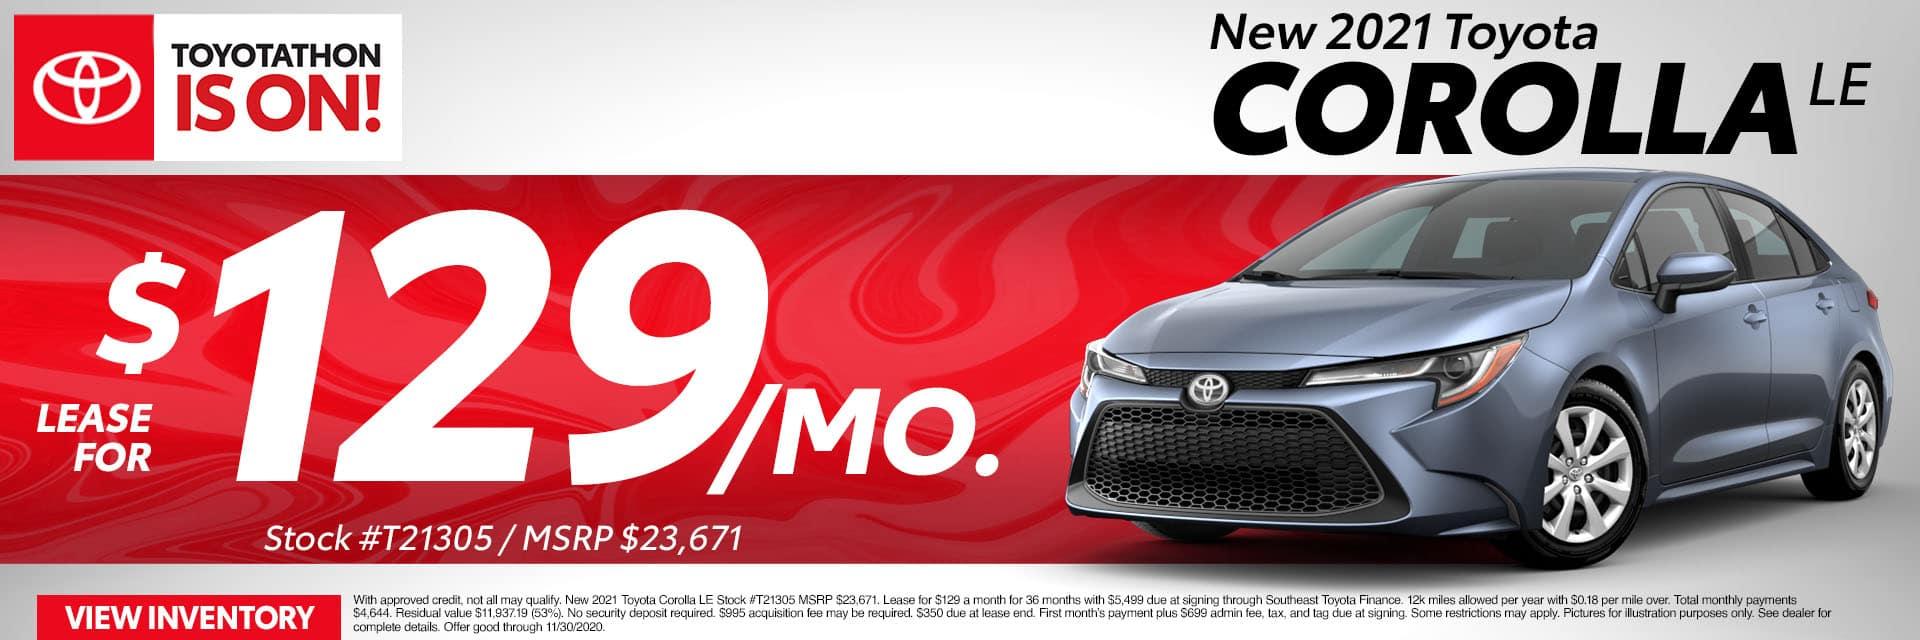 CLTW-November 2020-2021 Toyota Corolla